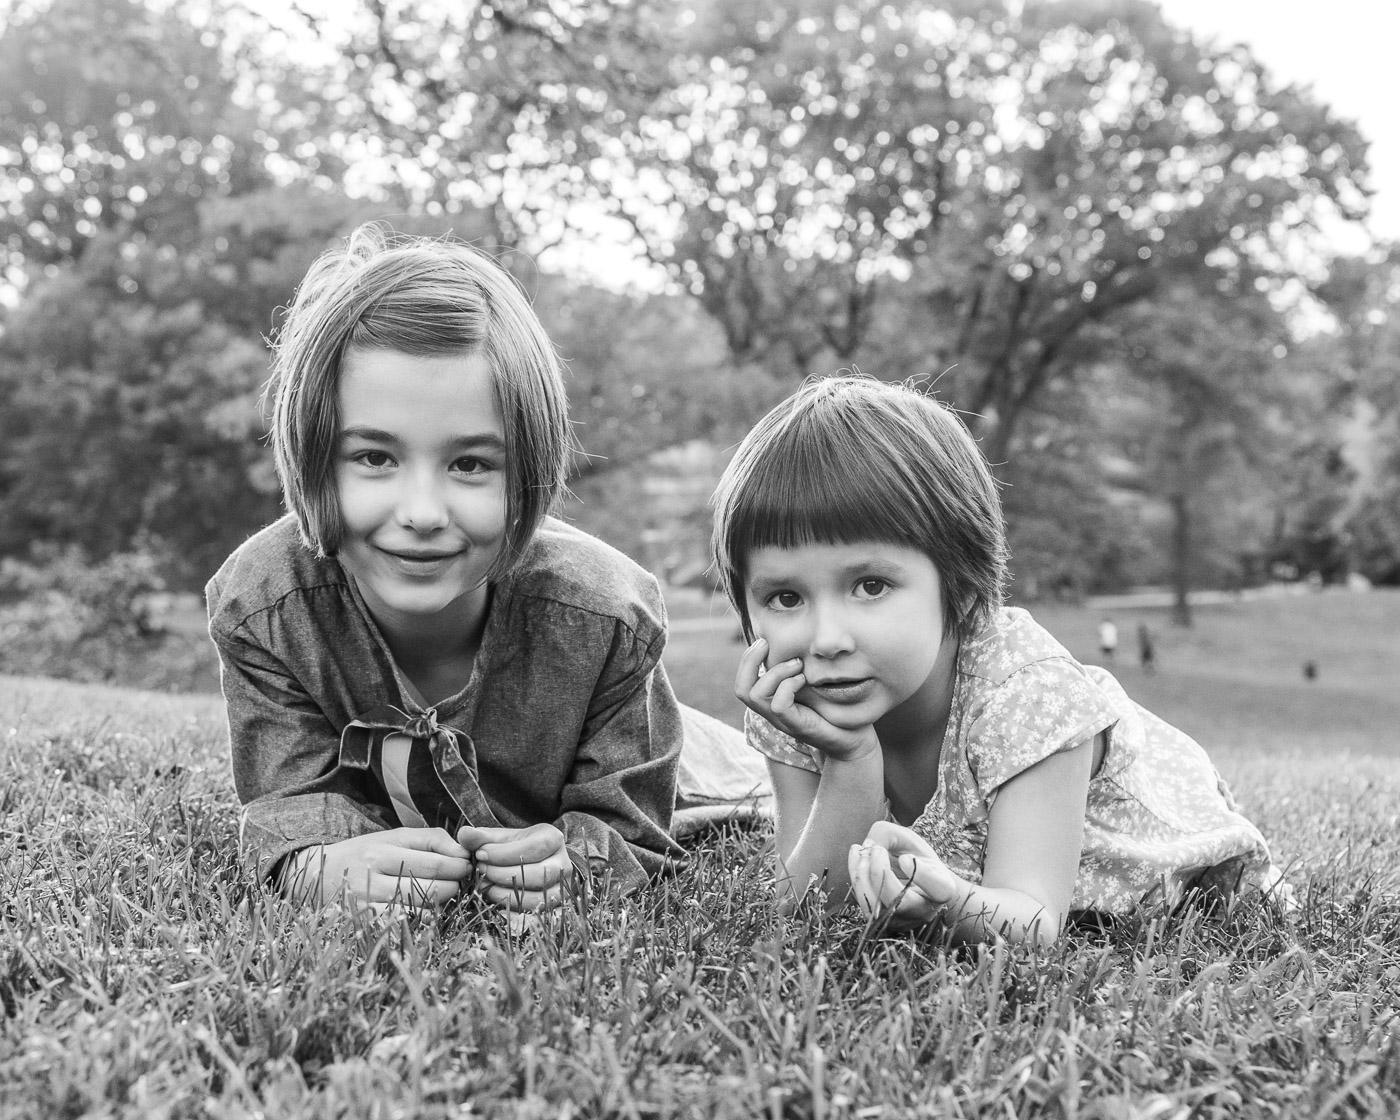 Child portrait photography - B&W